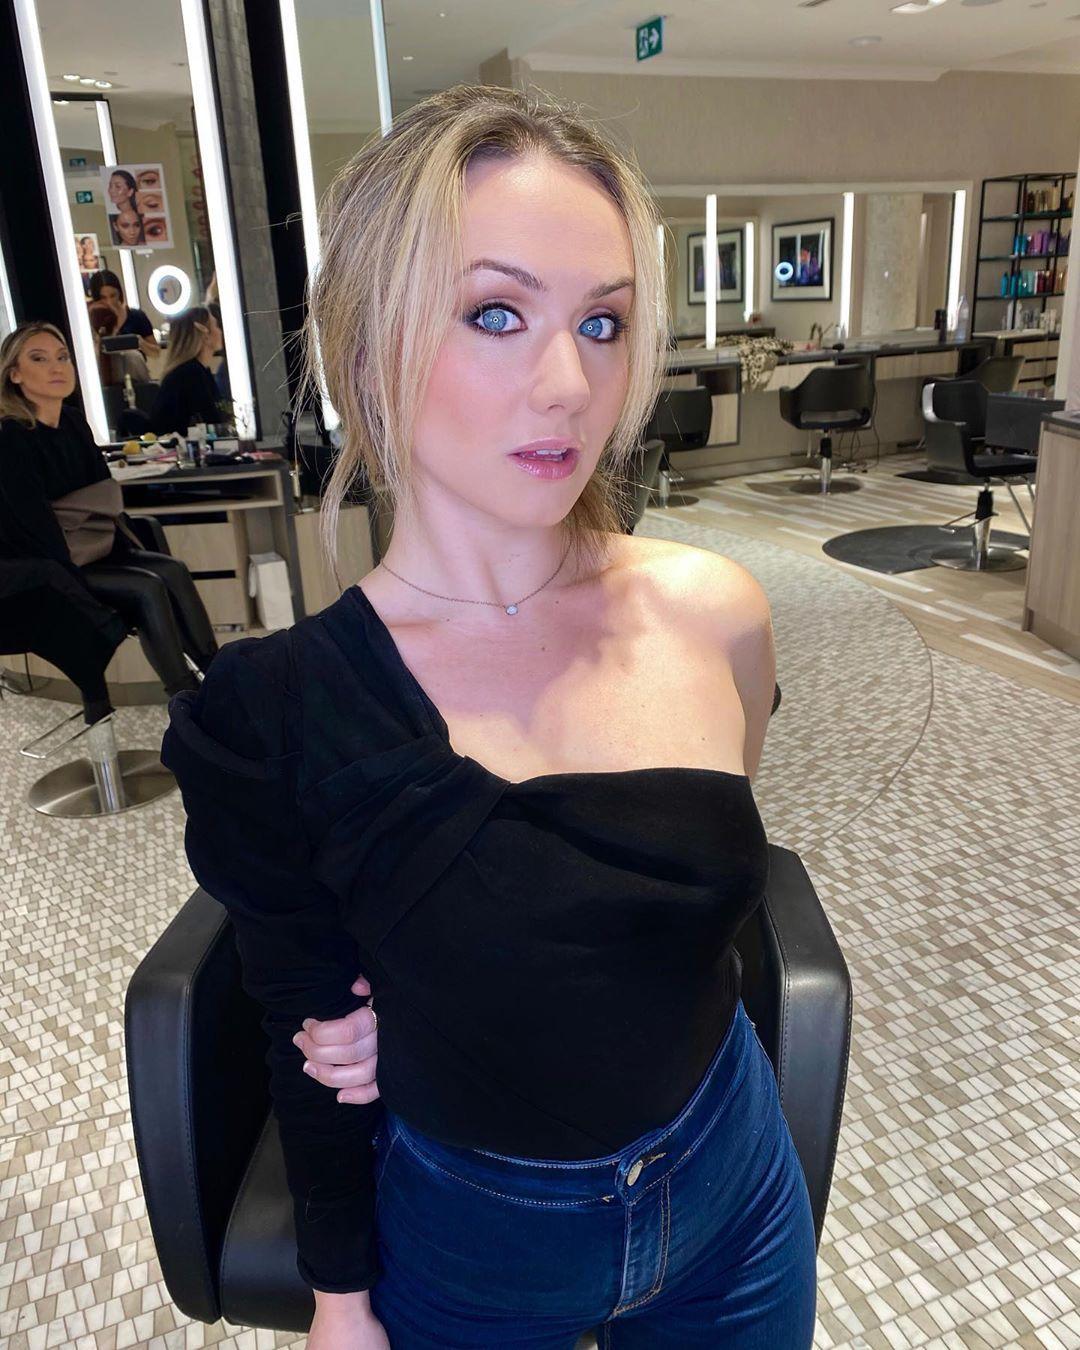 Celeste Bouchard Nude Leaked The Fappening 0019